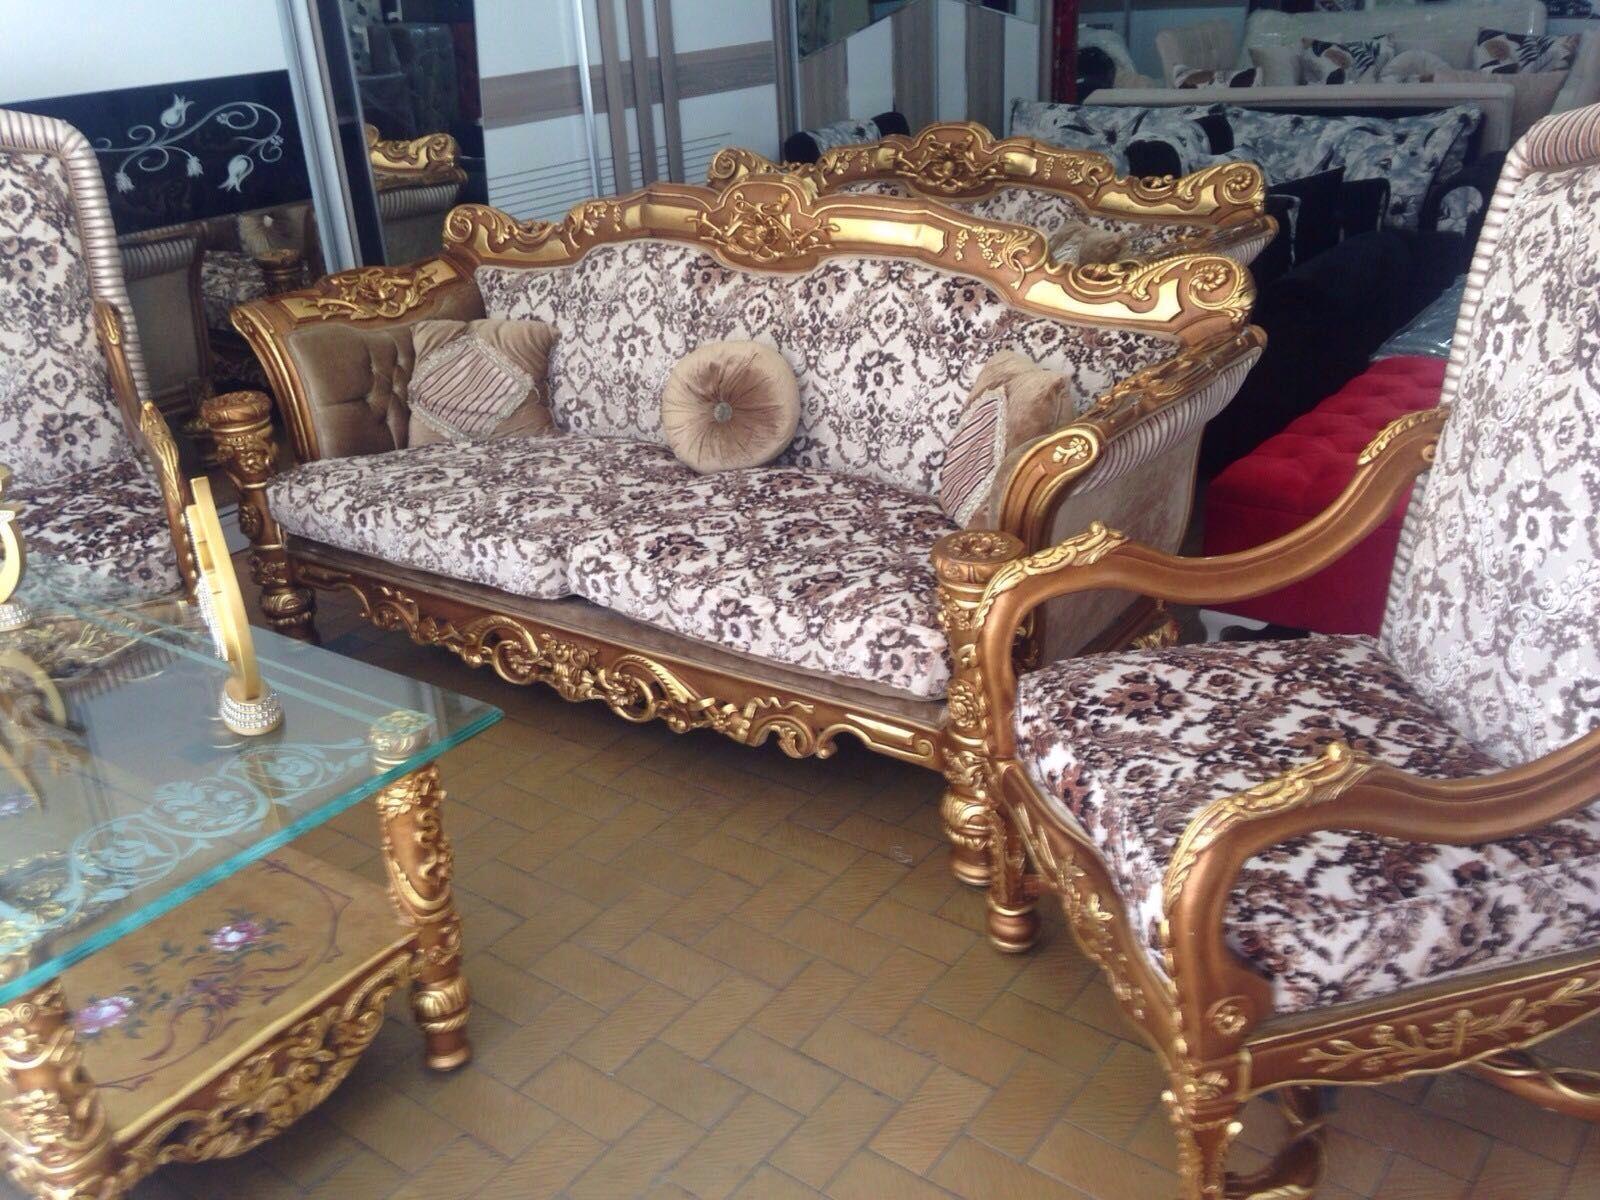 Ikinci El Mobilya Alan Yerler Ikinci El Koltuk Alan Yerler Ikinci El Koltuk Takimi Klasik Oymali Ahsap Jpg 1600 1200 Furniture Chair Decor